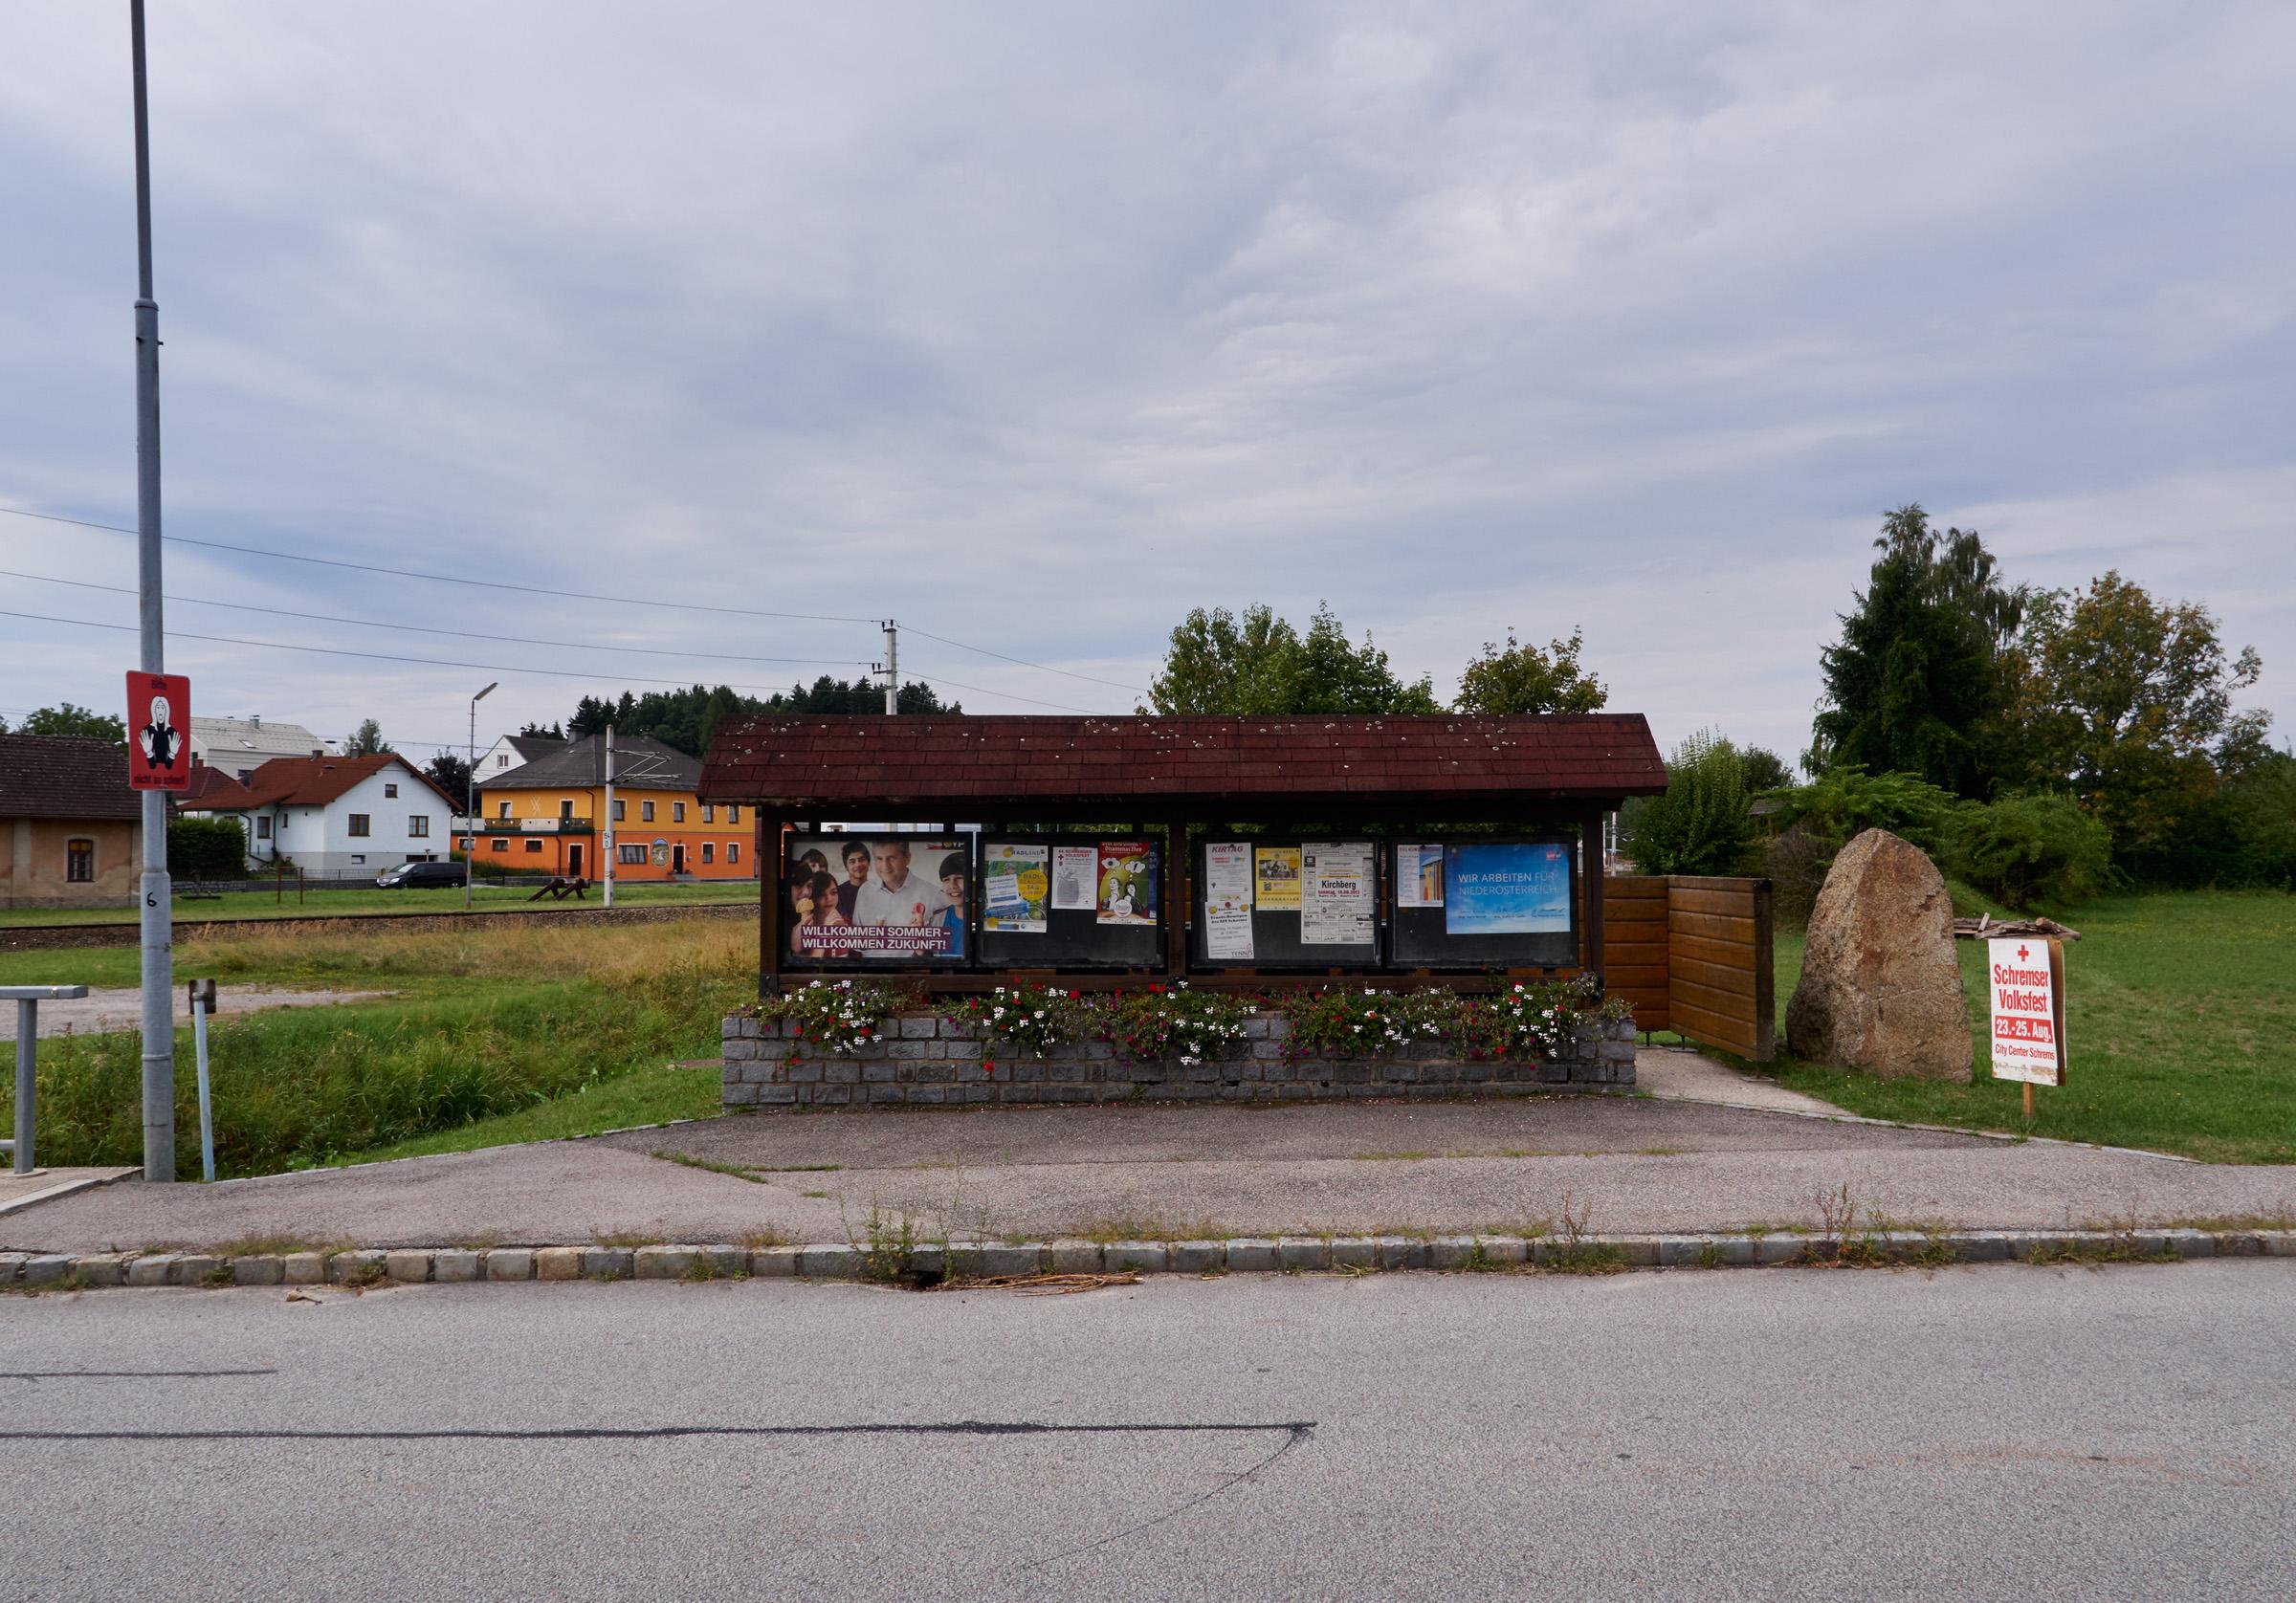 Pürbach weit 2013-08-19.jpg